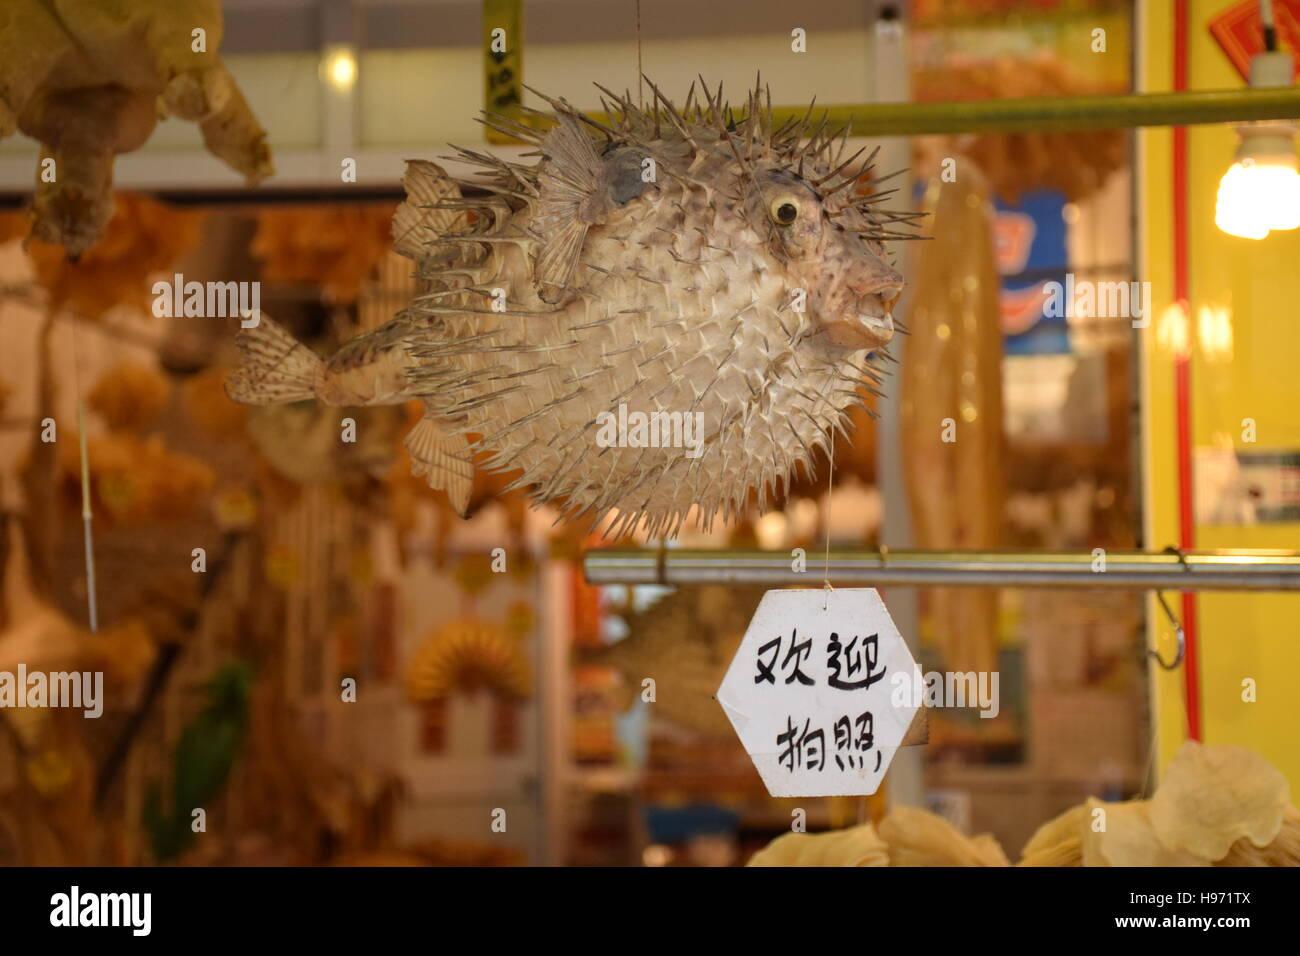 Souvenir of an embalmed puffer fish in a shop in Lantau island, Hong Kong - China - Stock Image